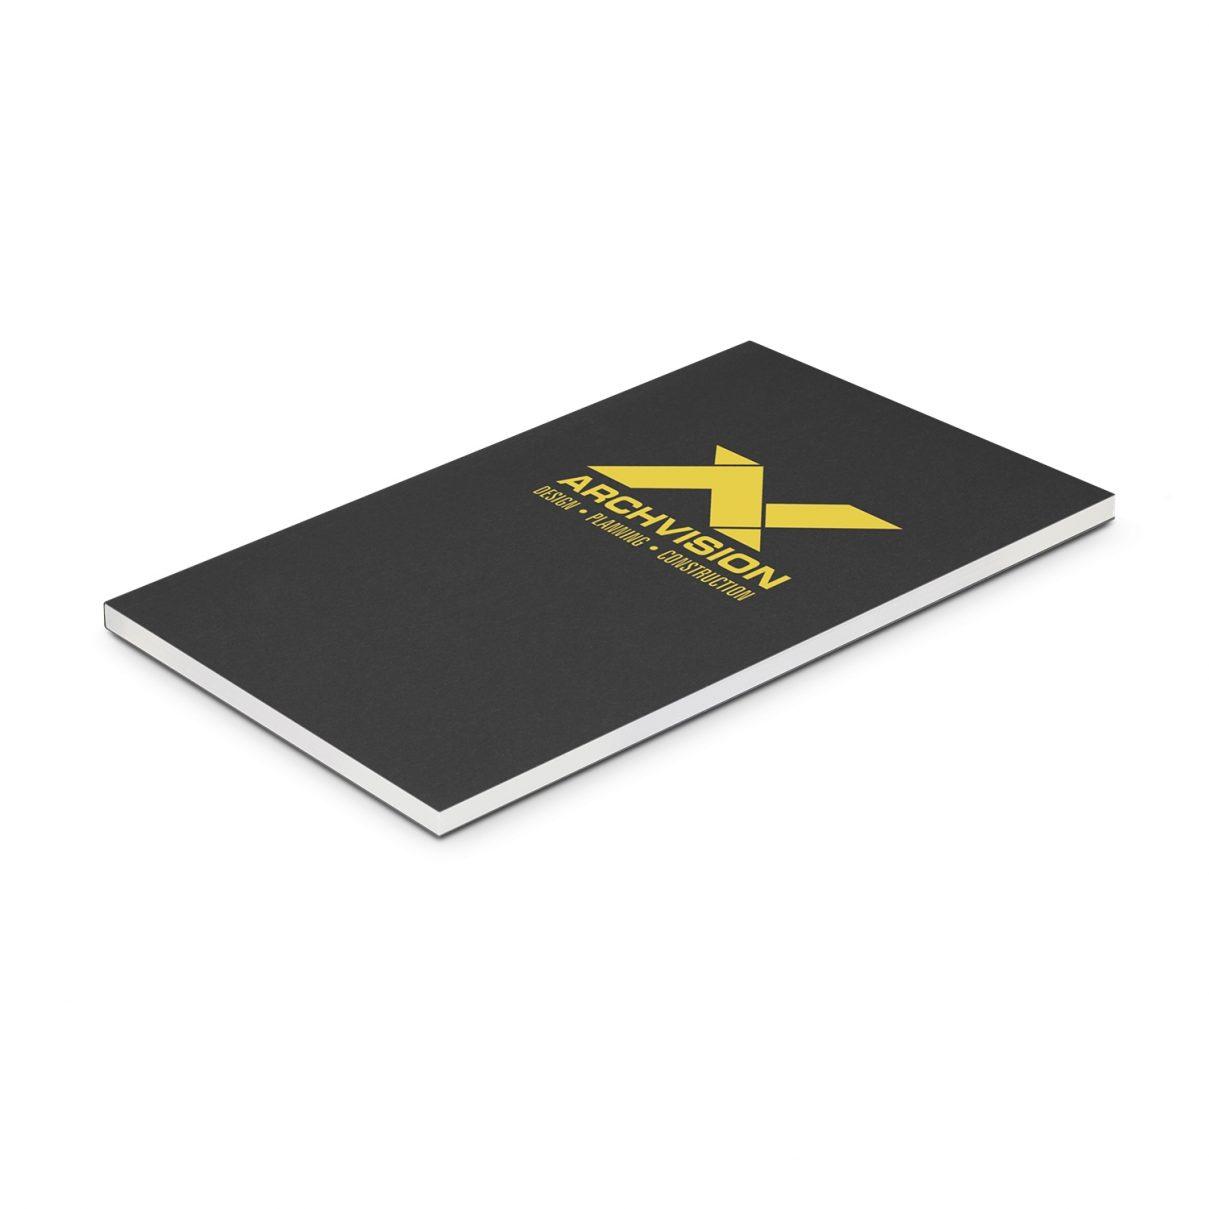 Reflex Note Pad - Medium Bulk Supplier